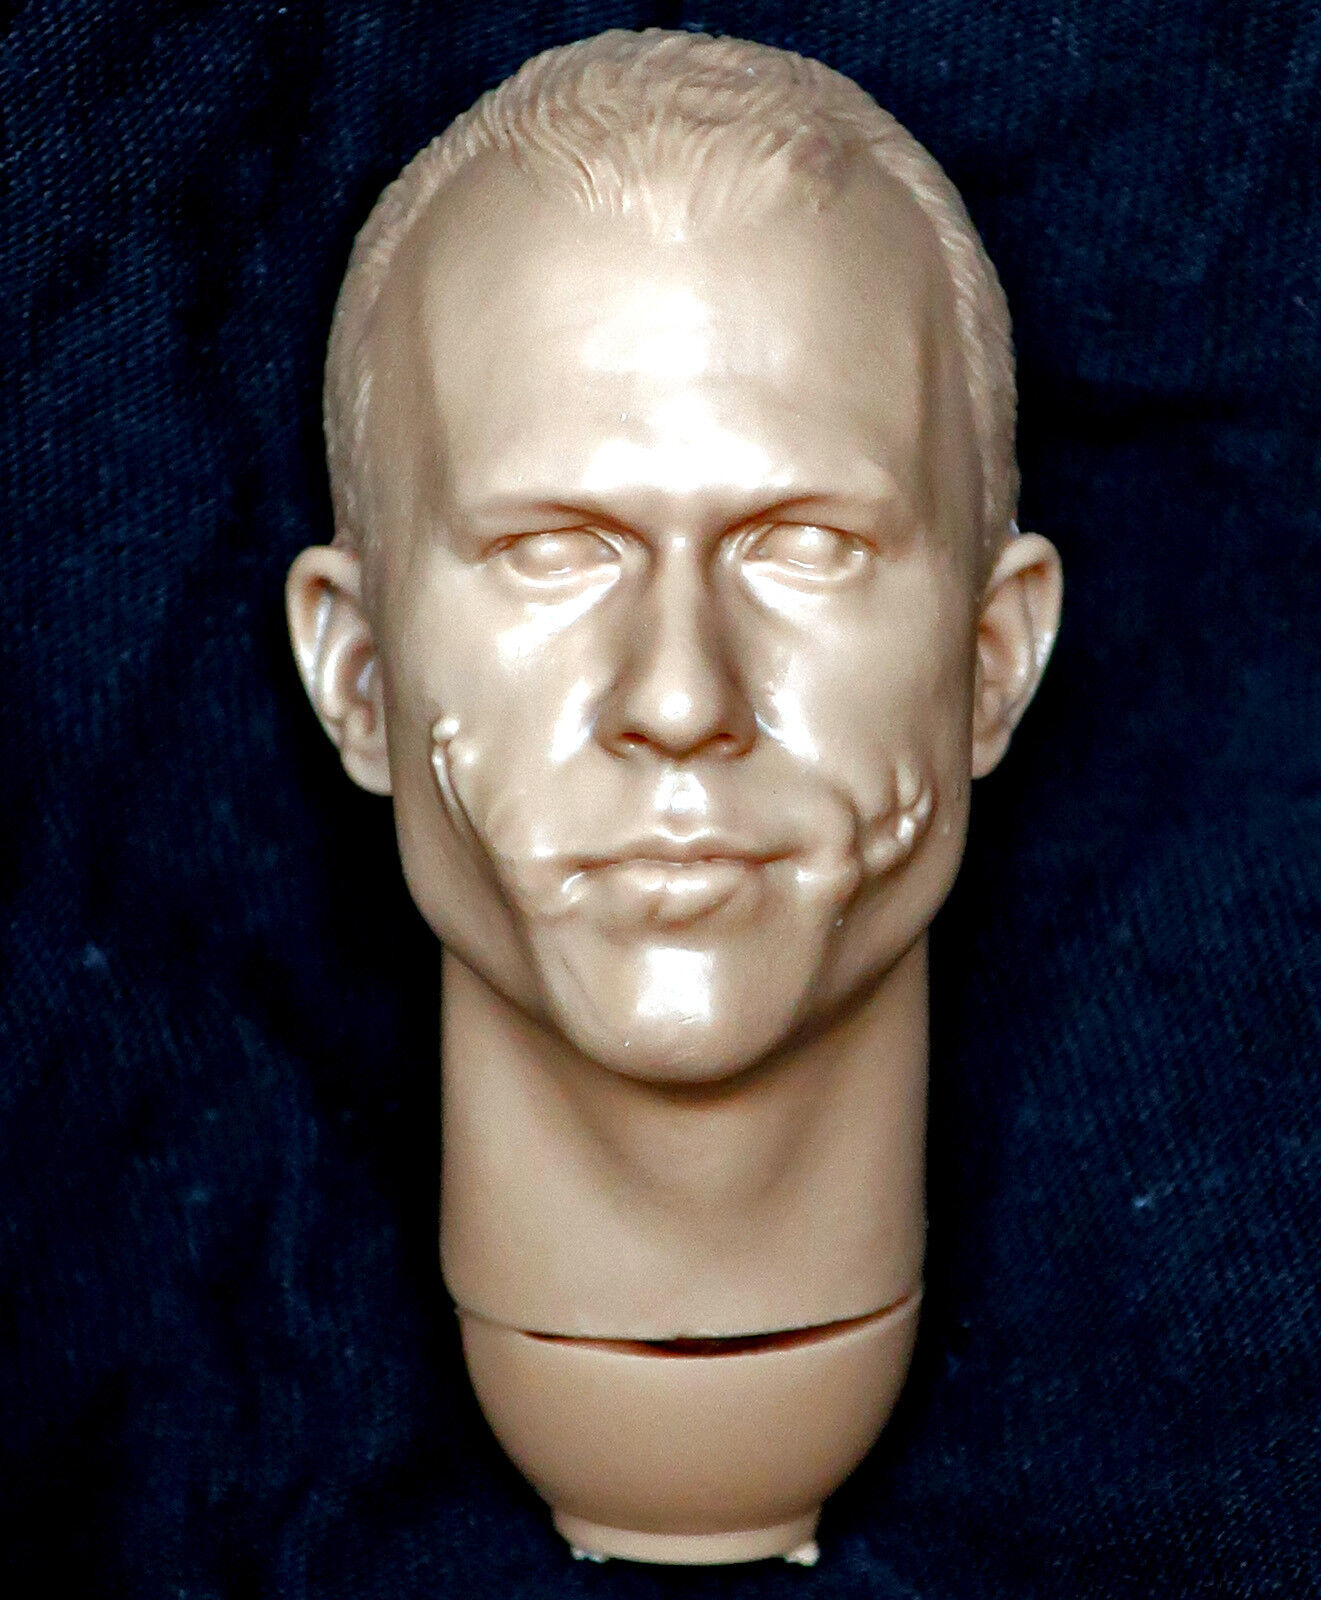 1 6 scale unpainted action figure head sculpt joker dark knight DX adam bobby